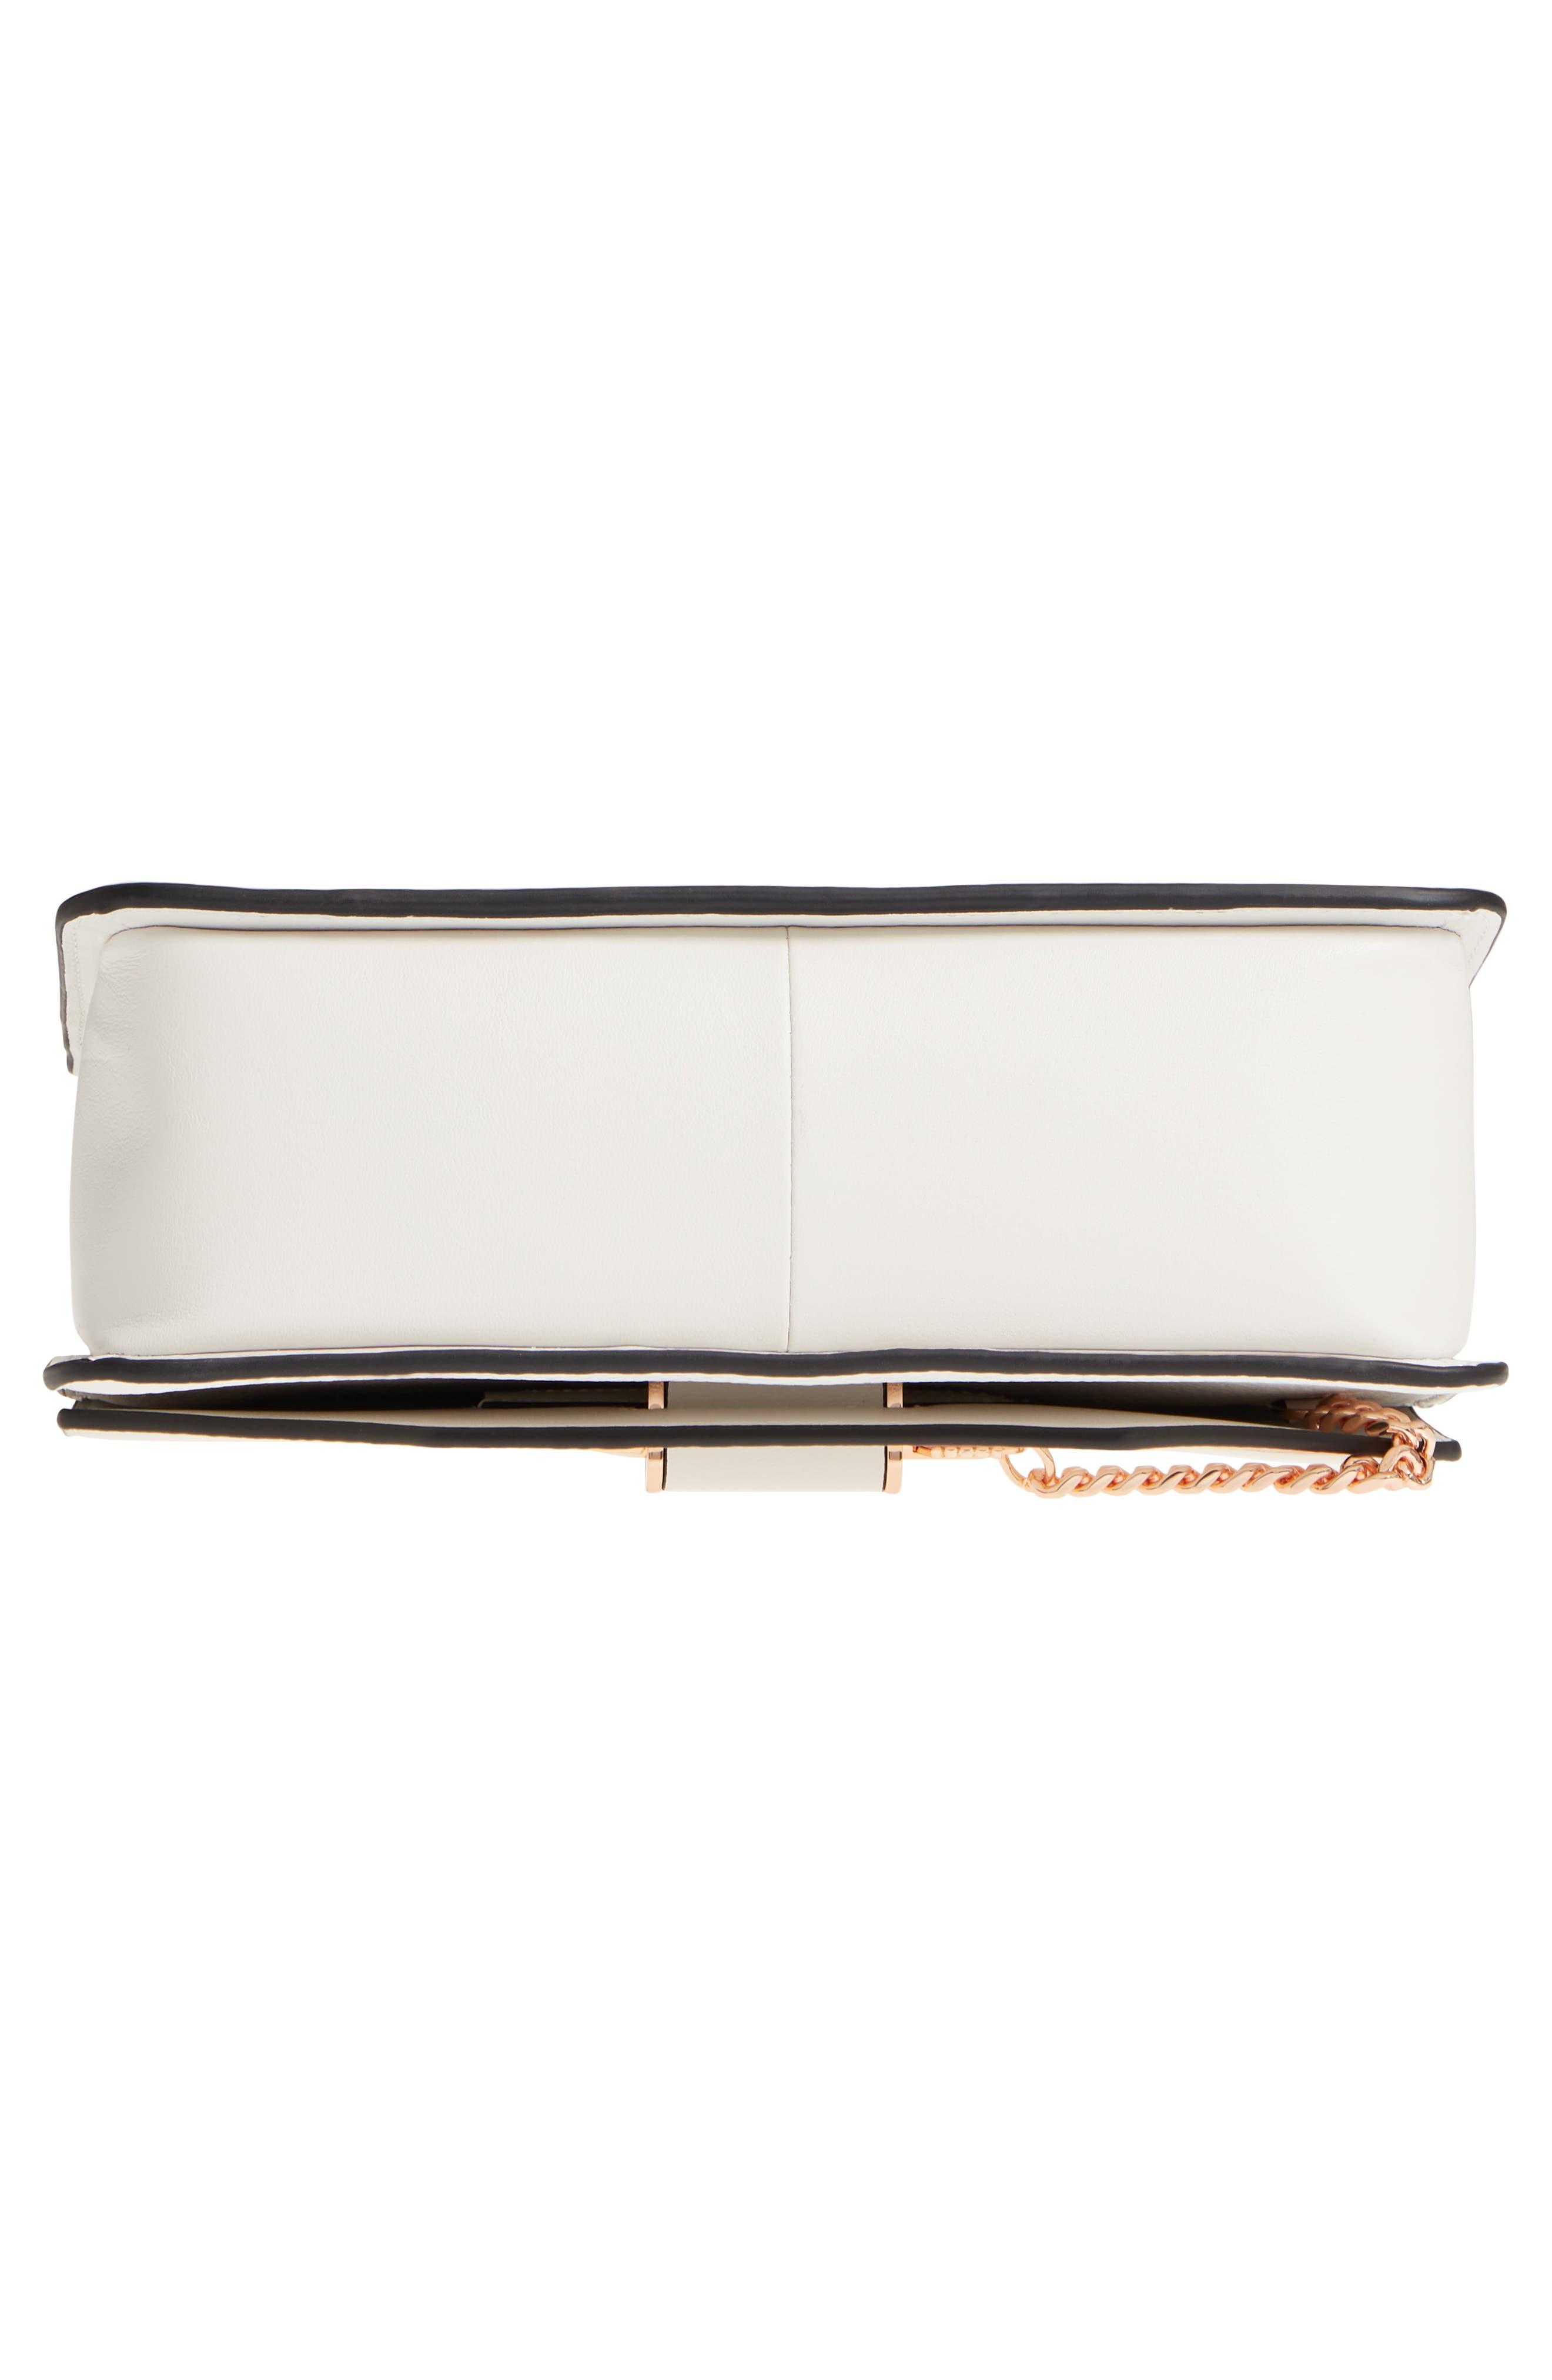 Cortney Nappa Leather Shoulder/Crossbody Bag,                             Alternate thumbnail 6, color,                             White/ Rose Gold